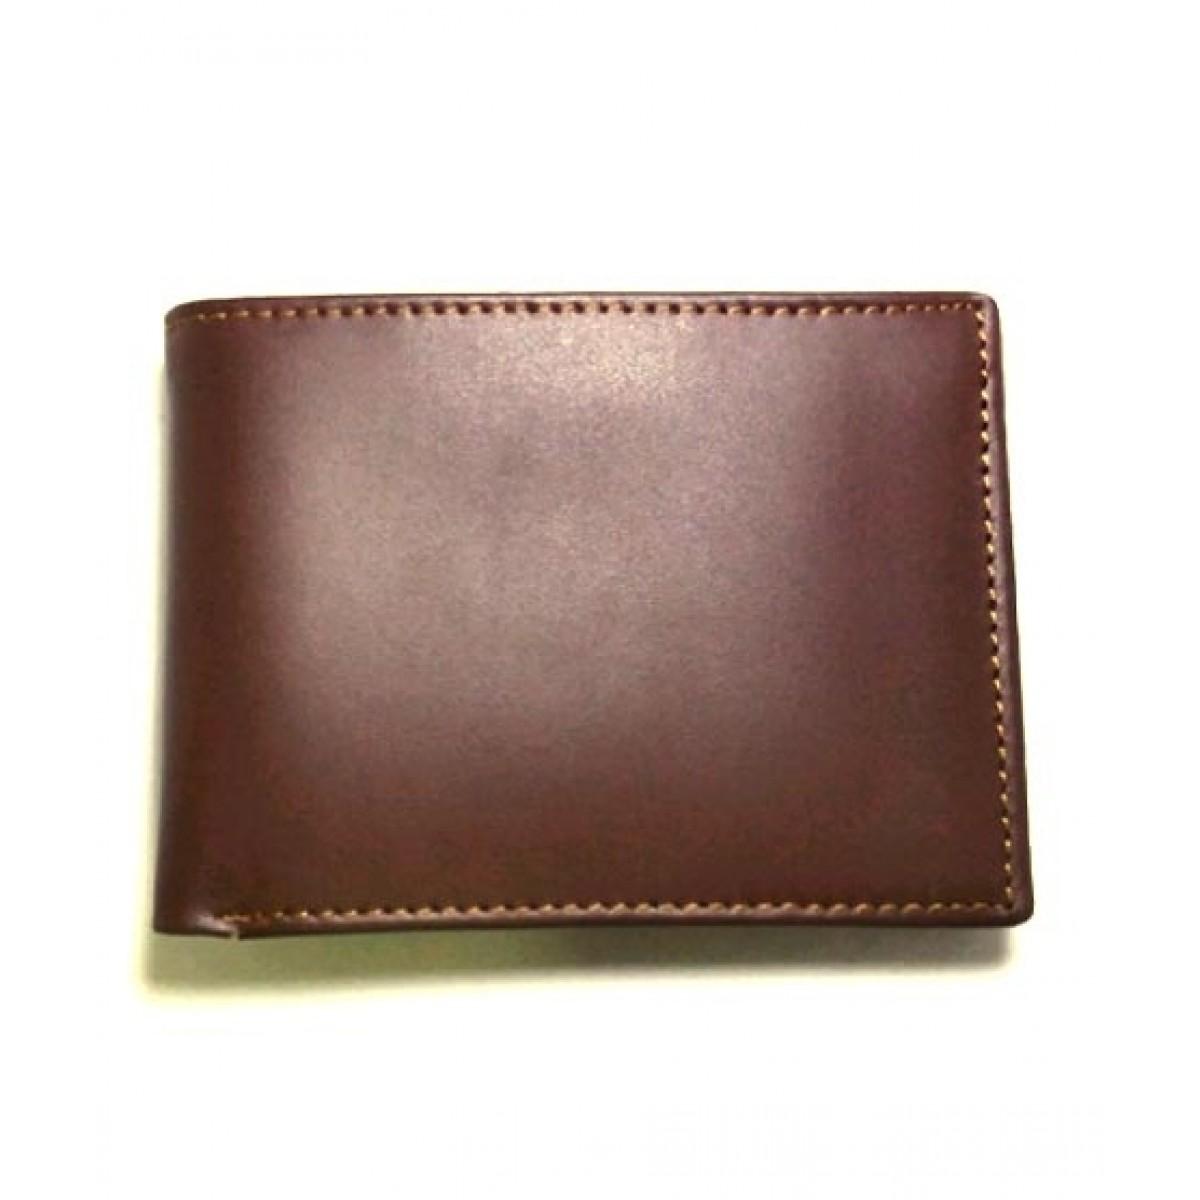 Afreeto Leather Wallet For Men Brown (0069)